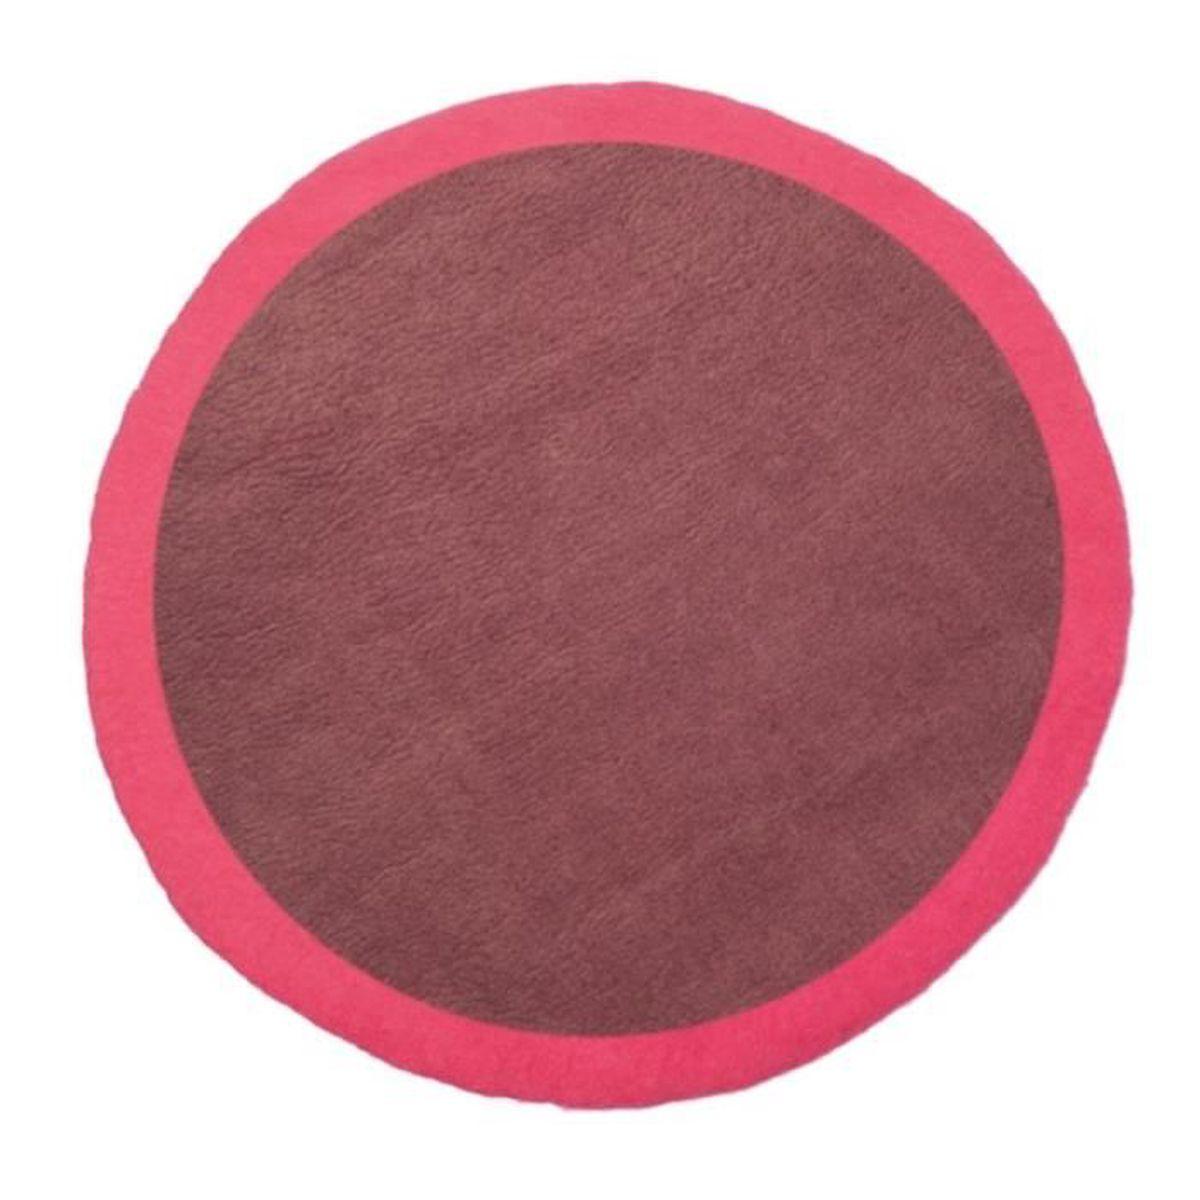 Tapis Rond Lumbini 120 Cm Ultra Rose Amethyste Violet Achat